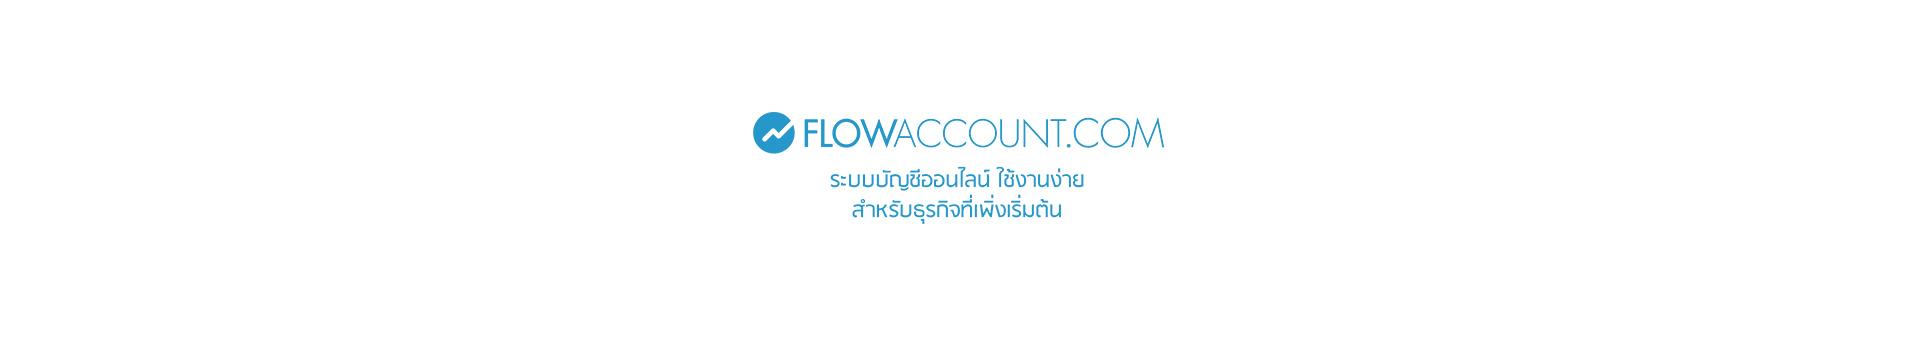 FlowAccount  cover photo